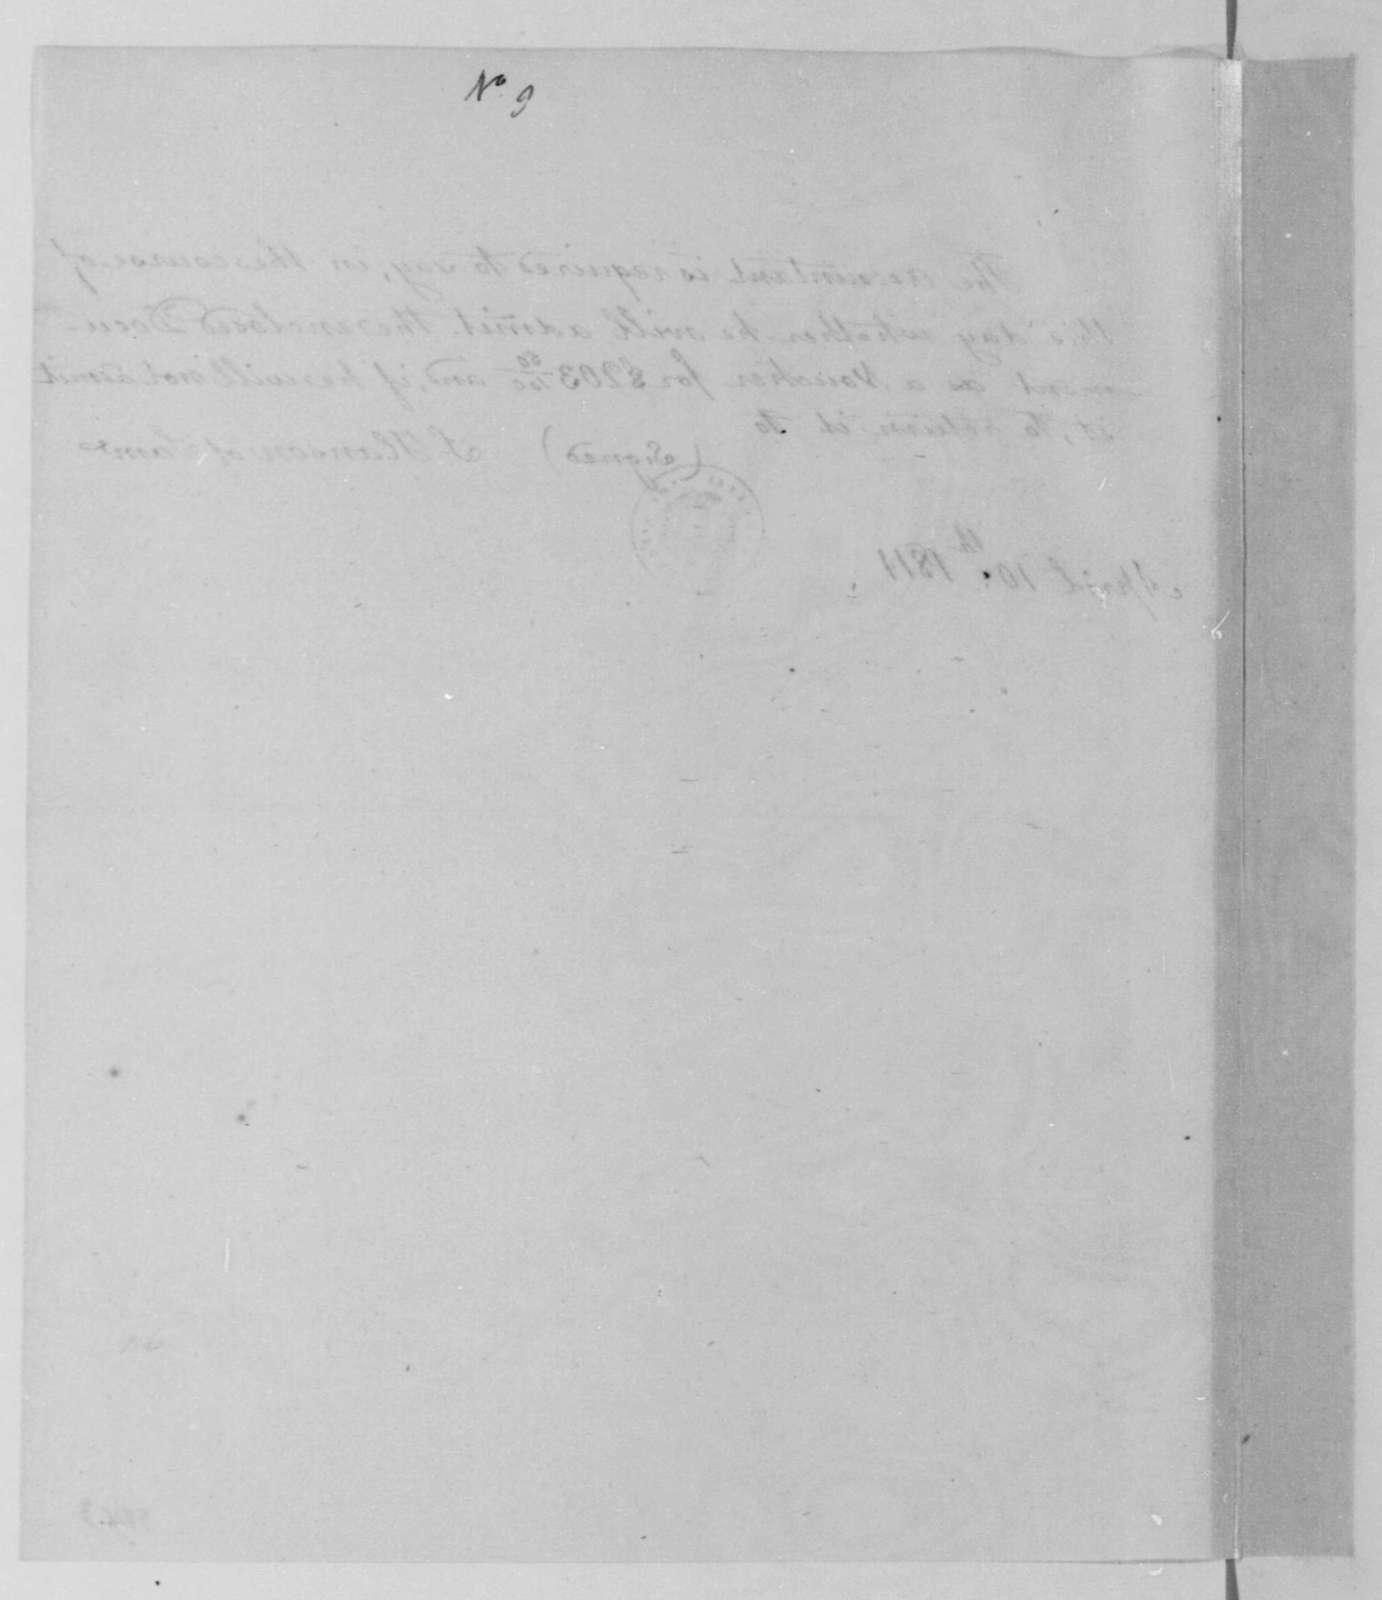 Samuel Hanson of Samuel to Thomas Turner, April 10, 1811. Instructions.